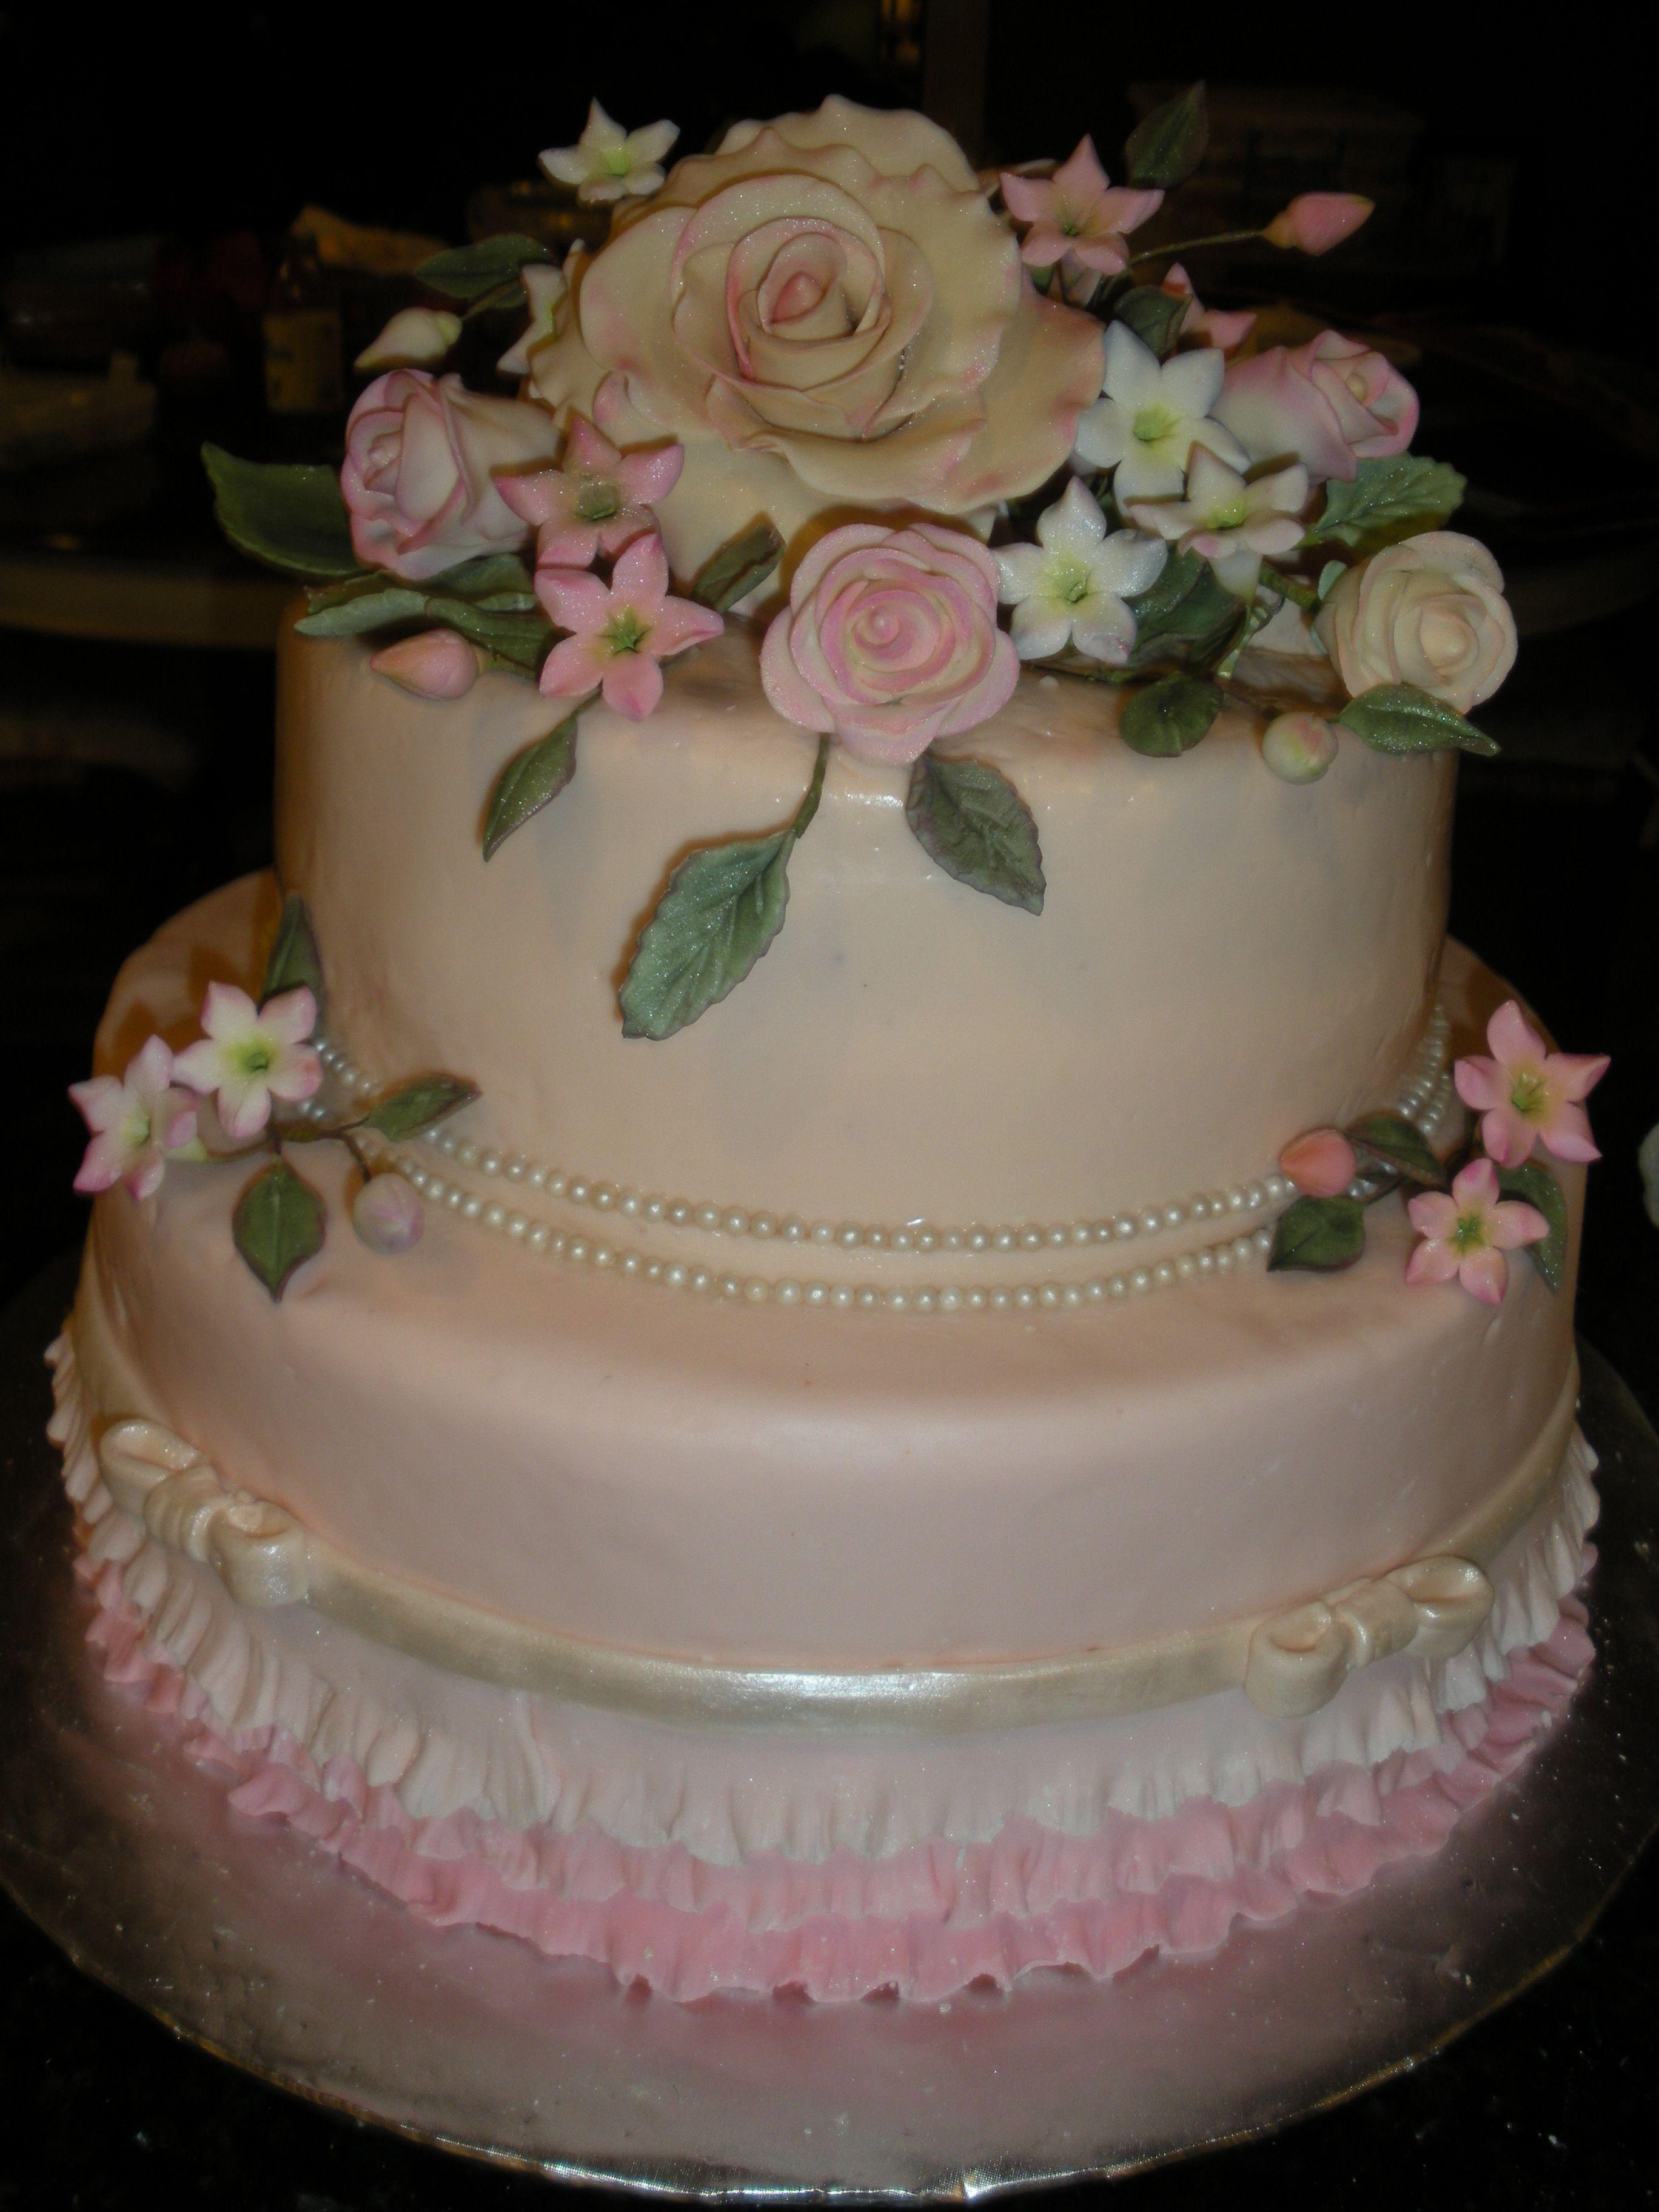 49++ Birthday cake for mom ideas ideas in 2021